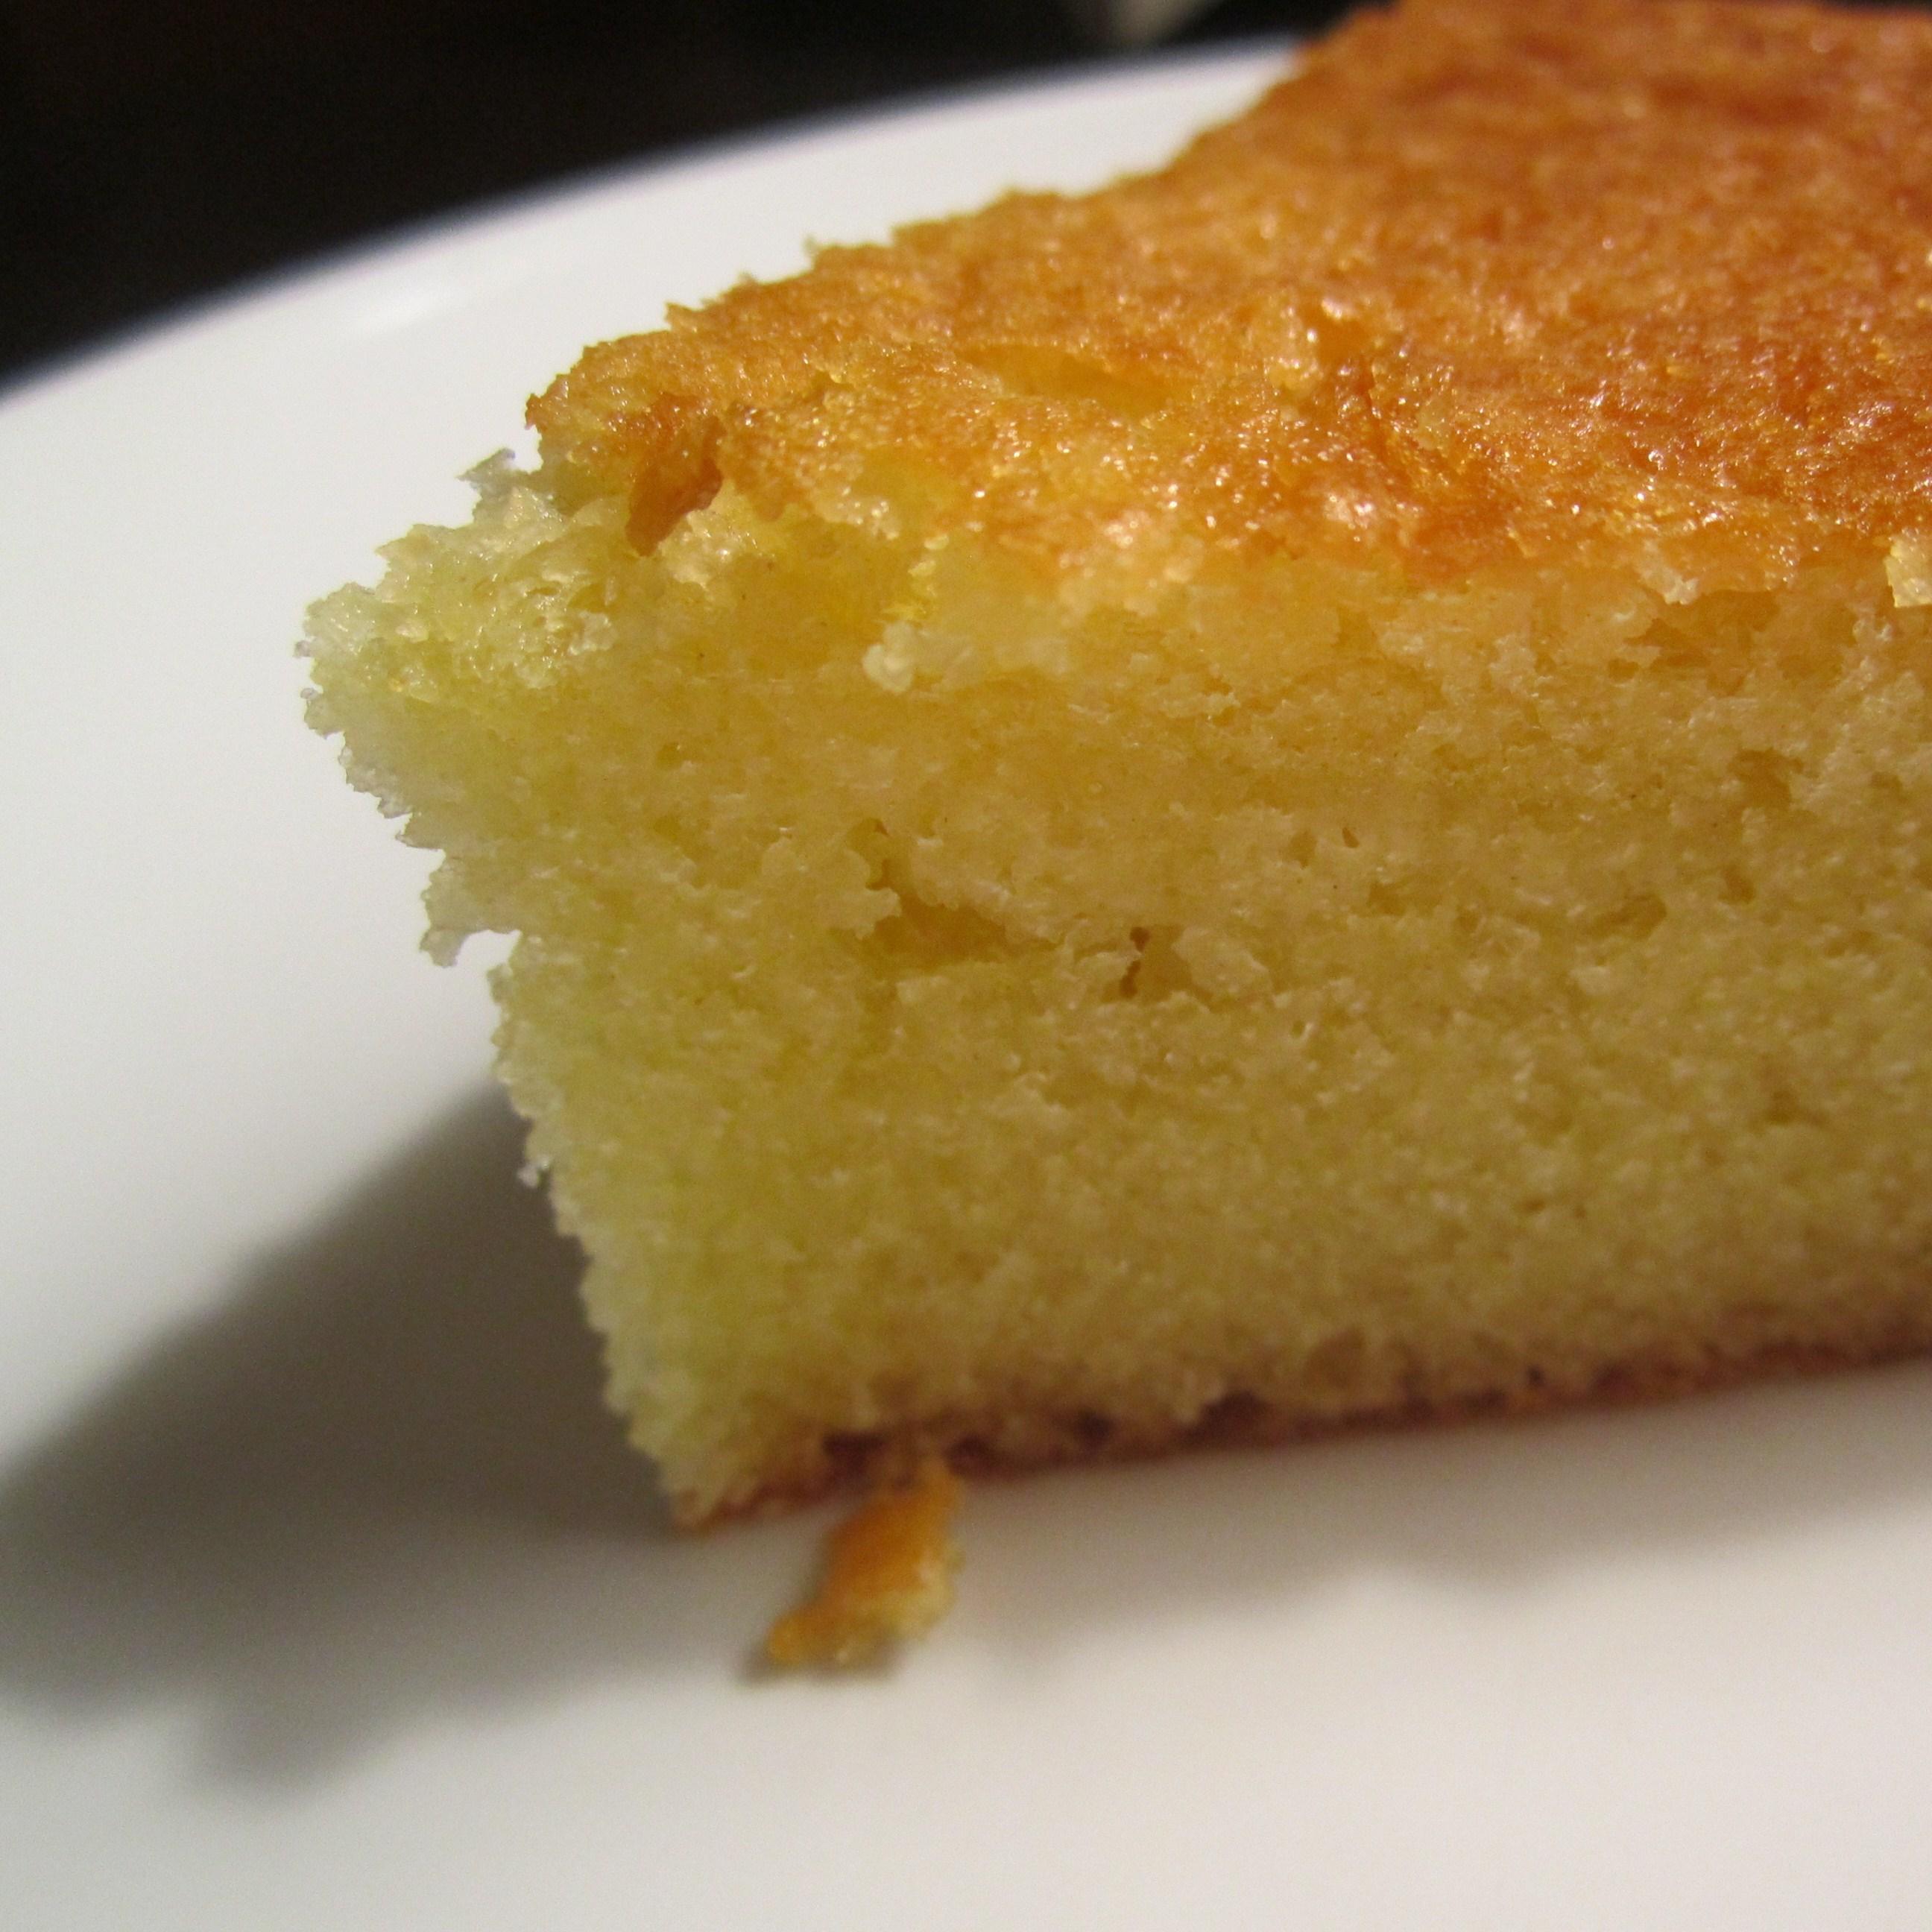 Yellow Cake FW BestGlycol